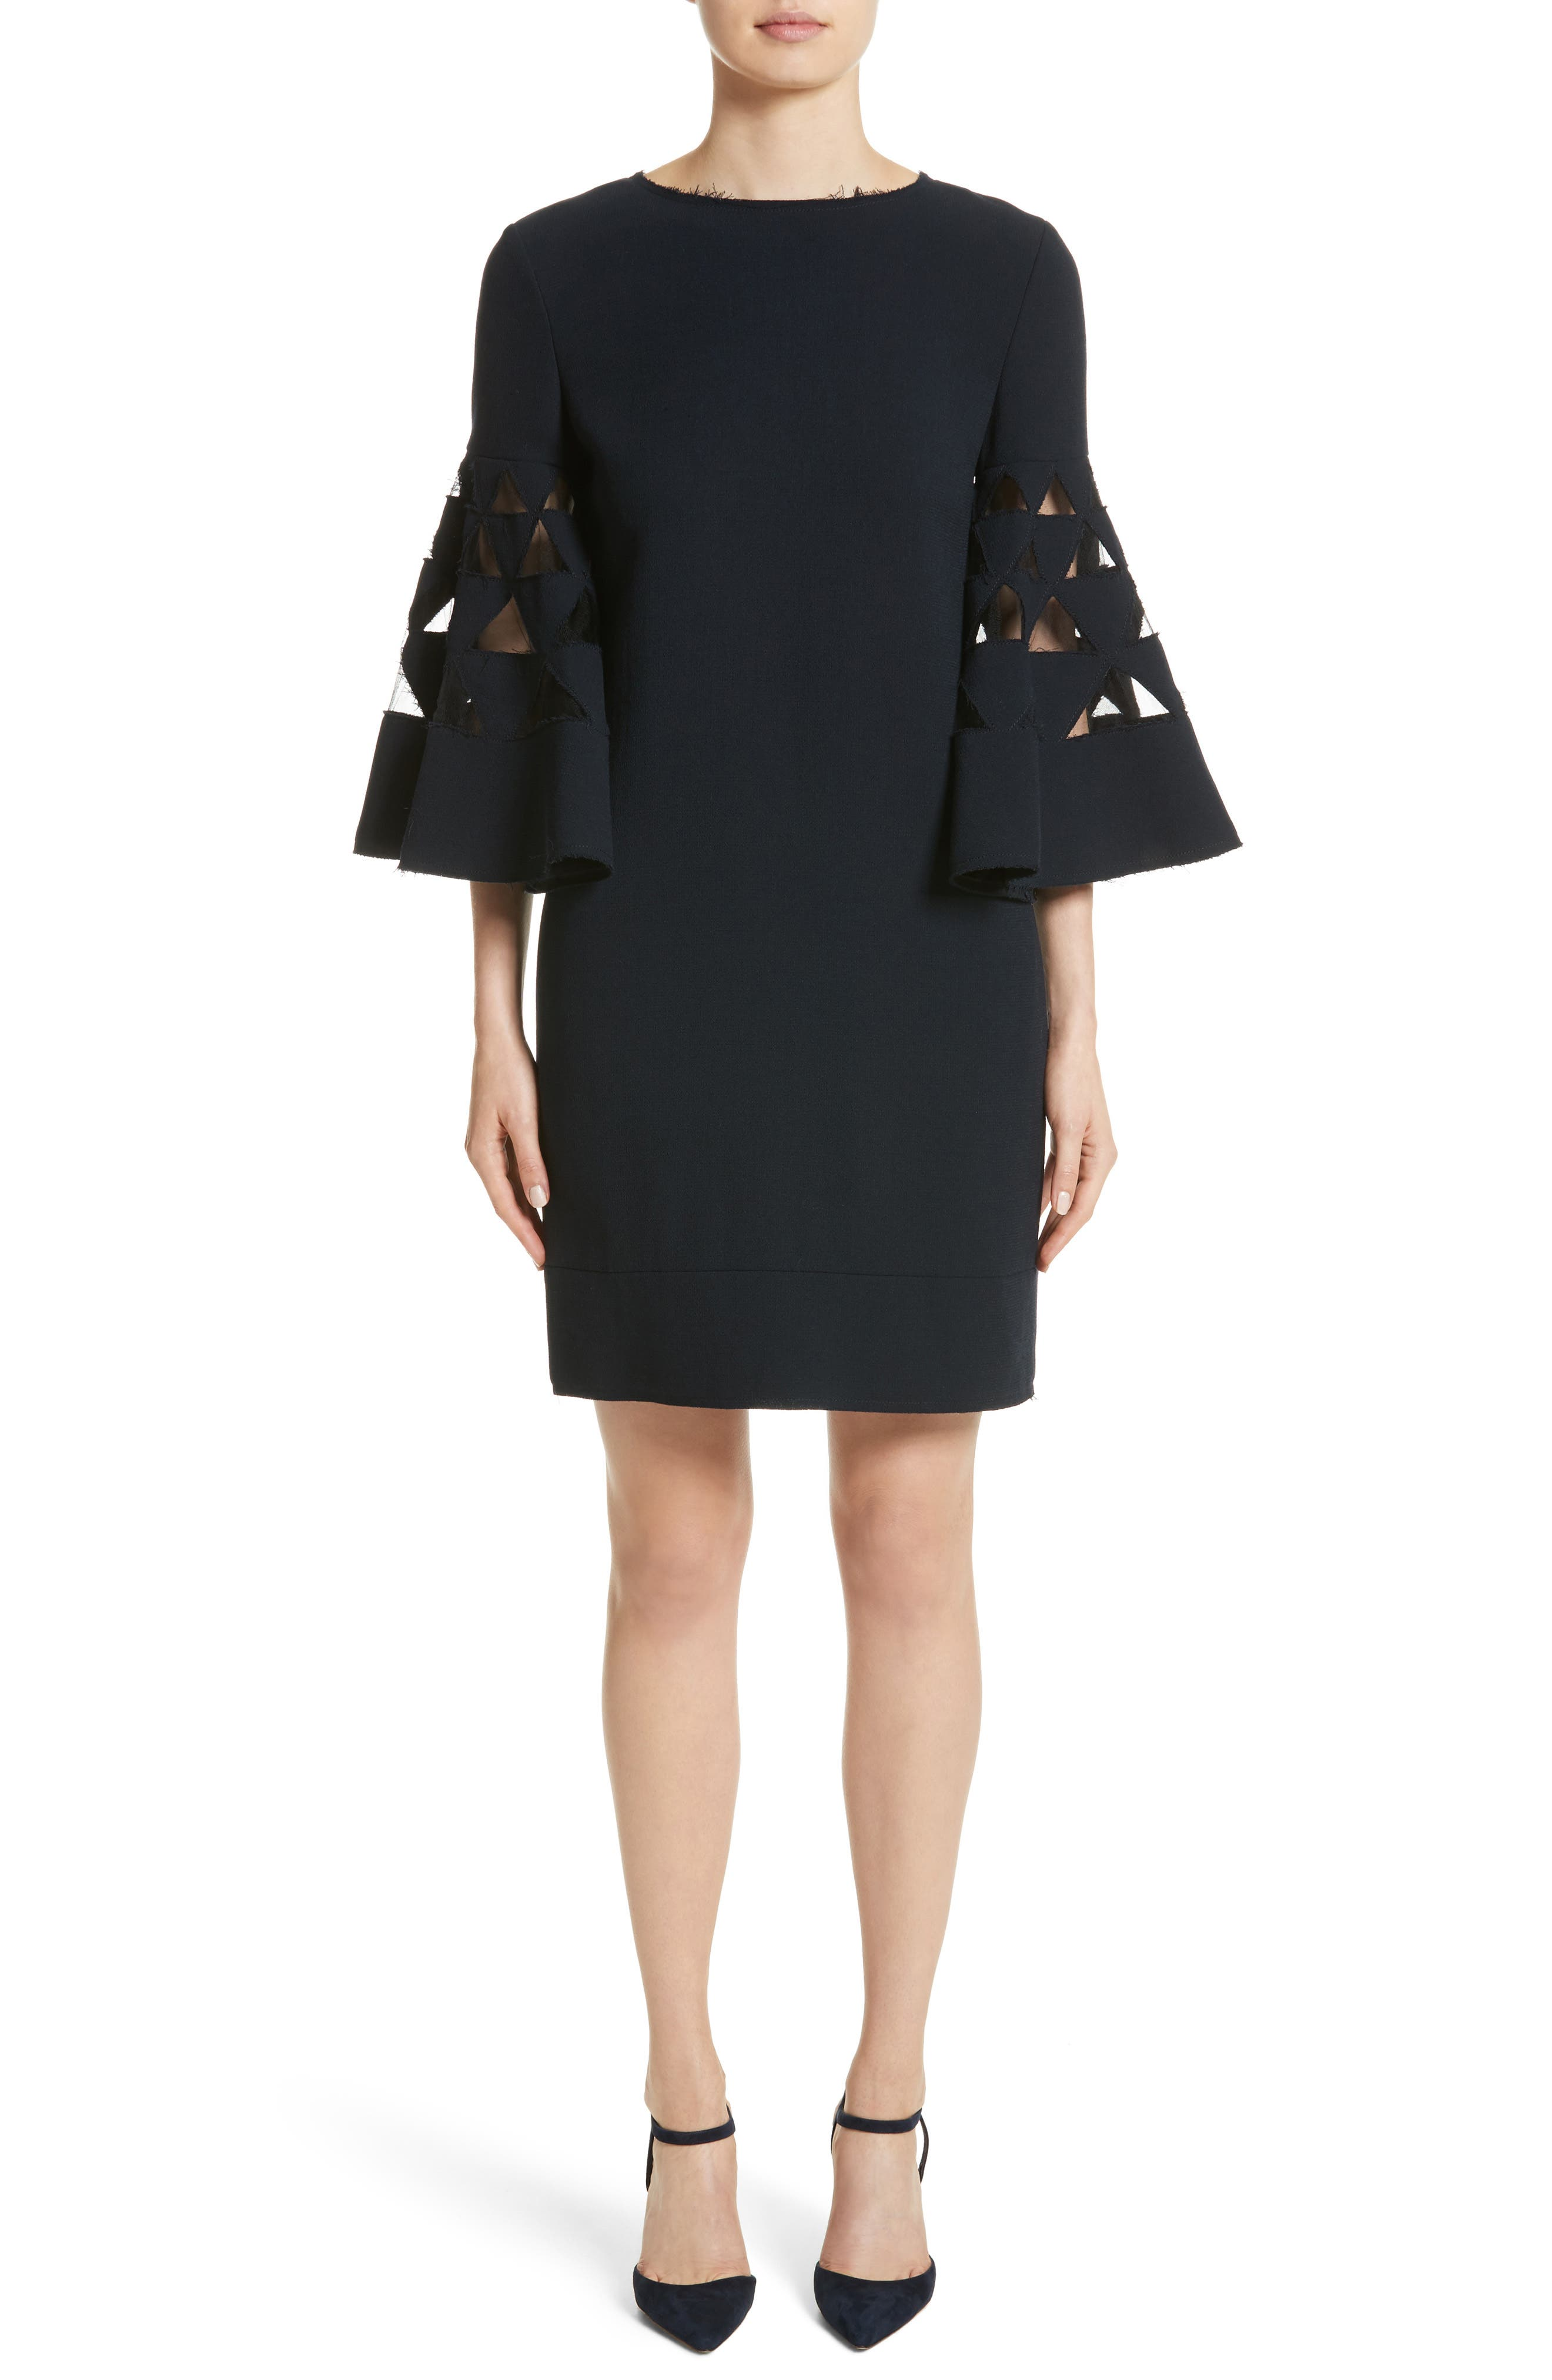 Alternate Image 1 Selected - Oscar de la Renta Cutout Bell Sleeve Stretch Wool Crepe Shift Dress